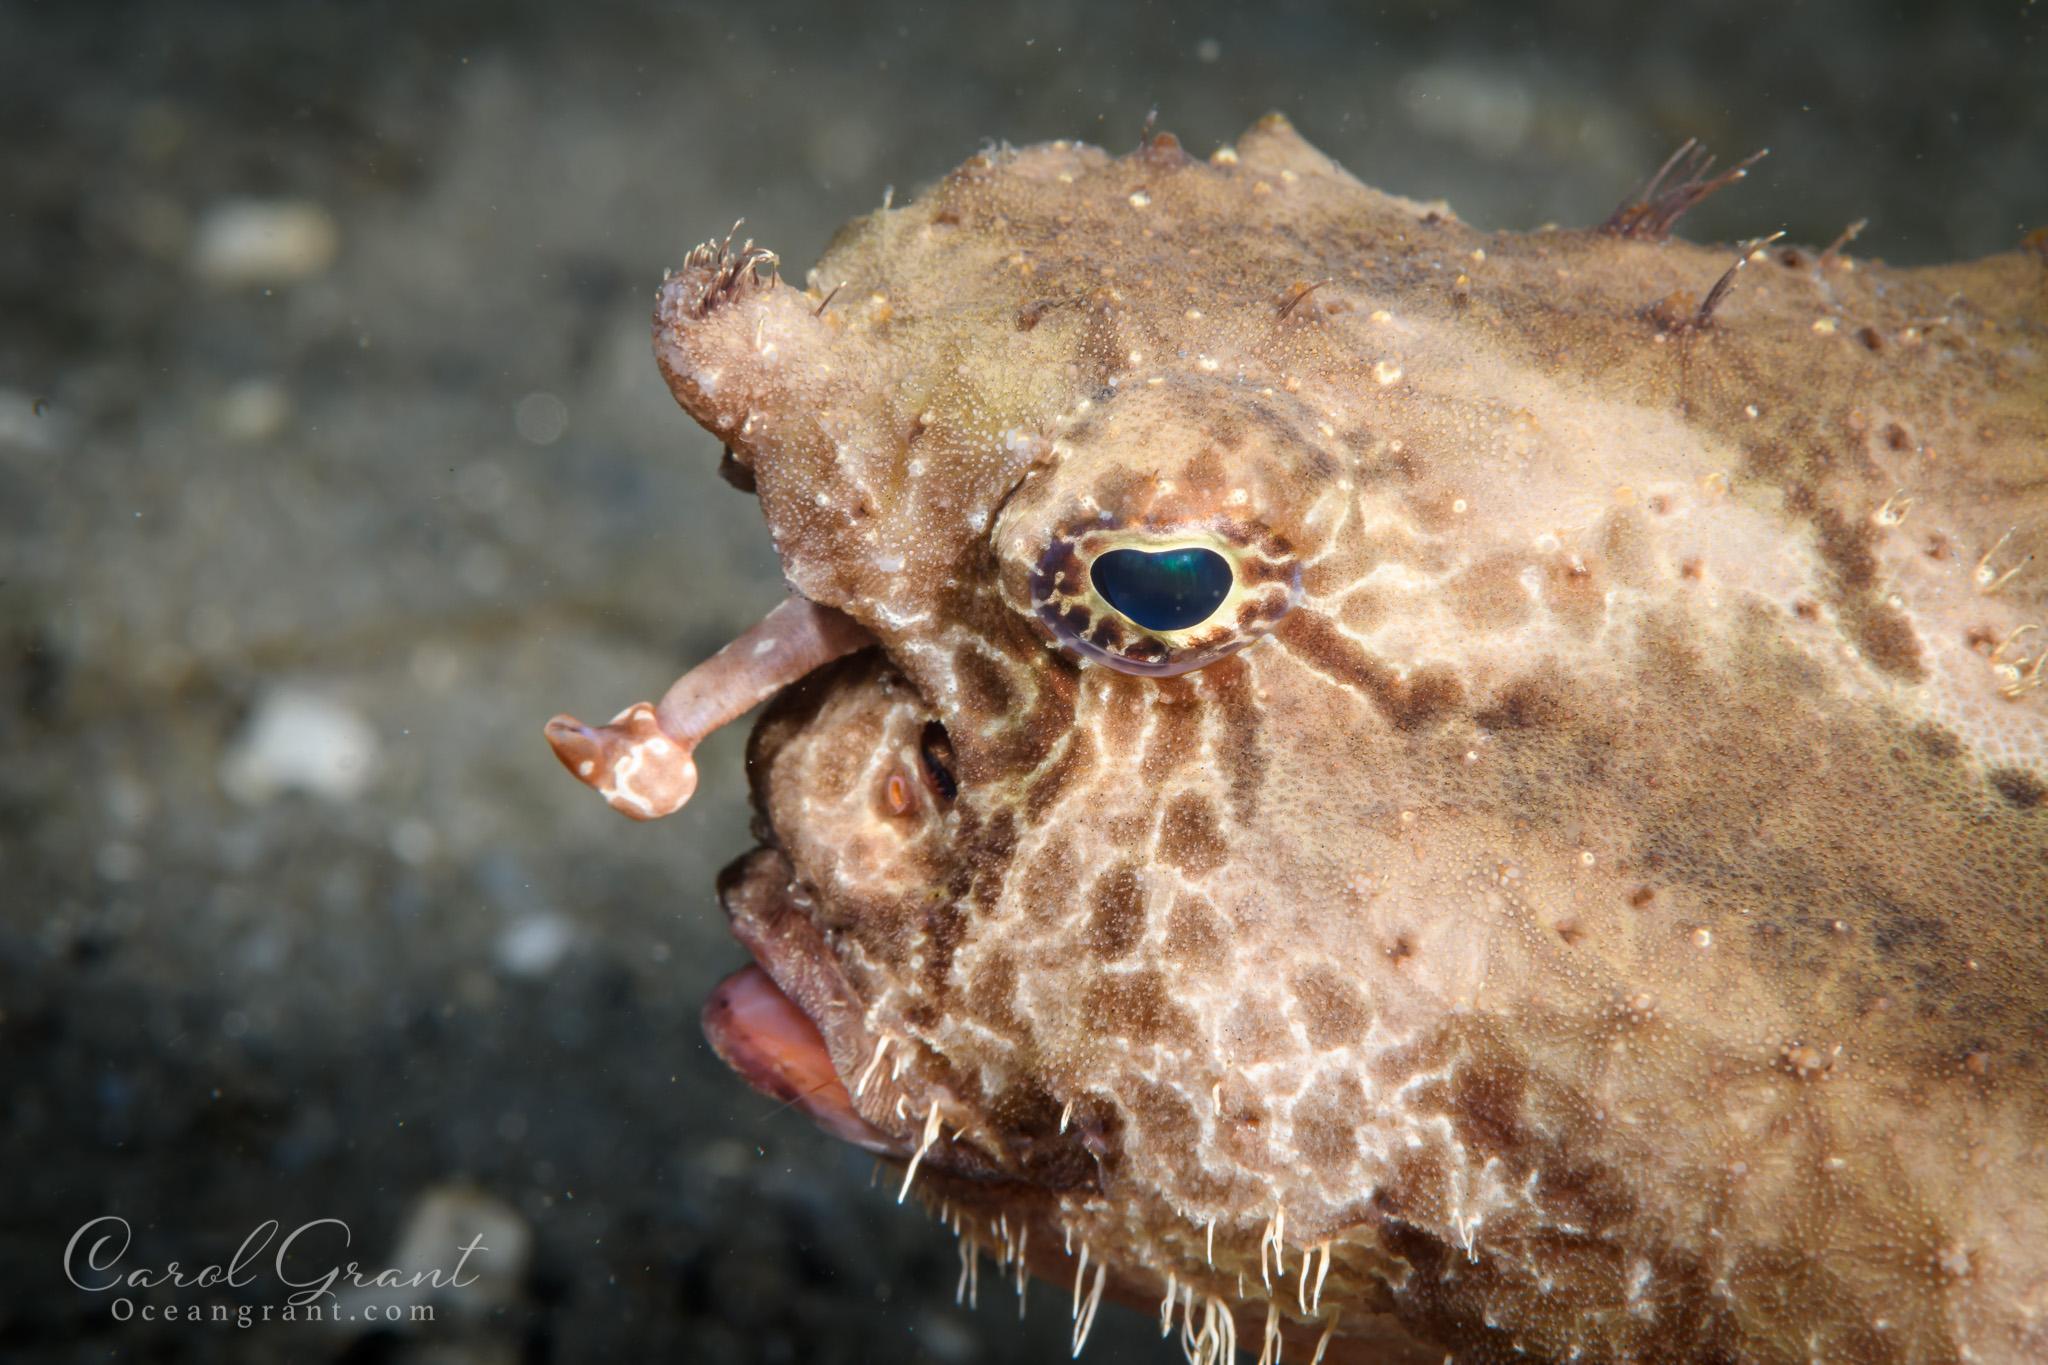 Polkadot baitfish lure,scuba diving,underwater,©️CGrant/Oceangrant.com